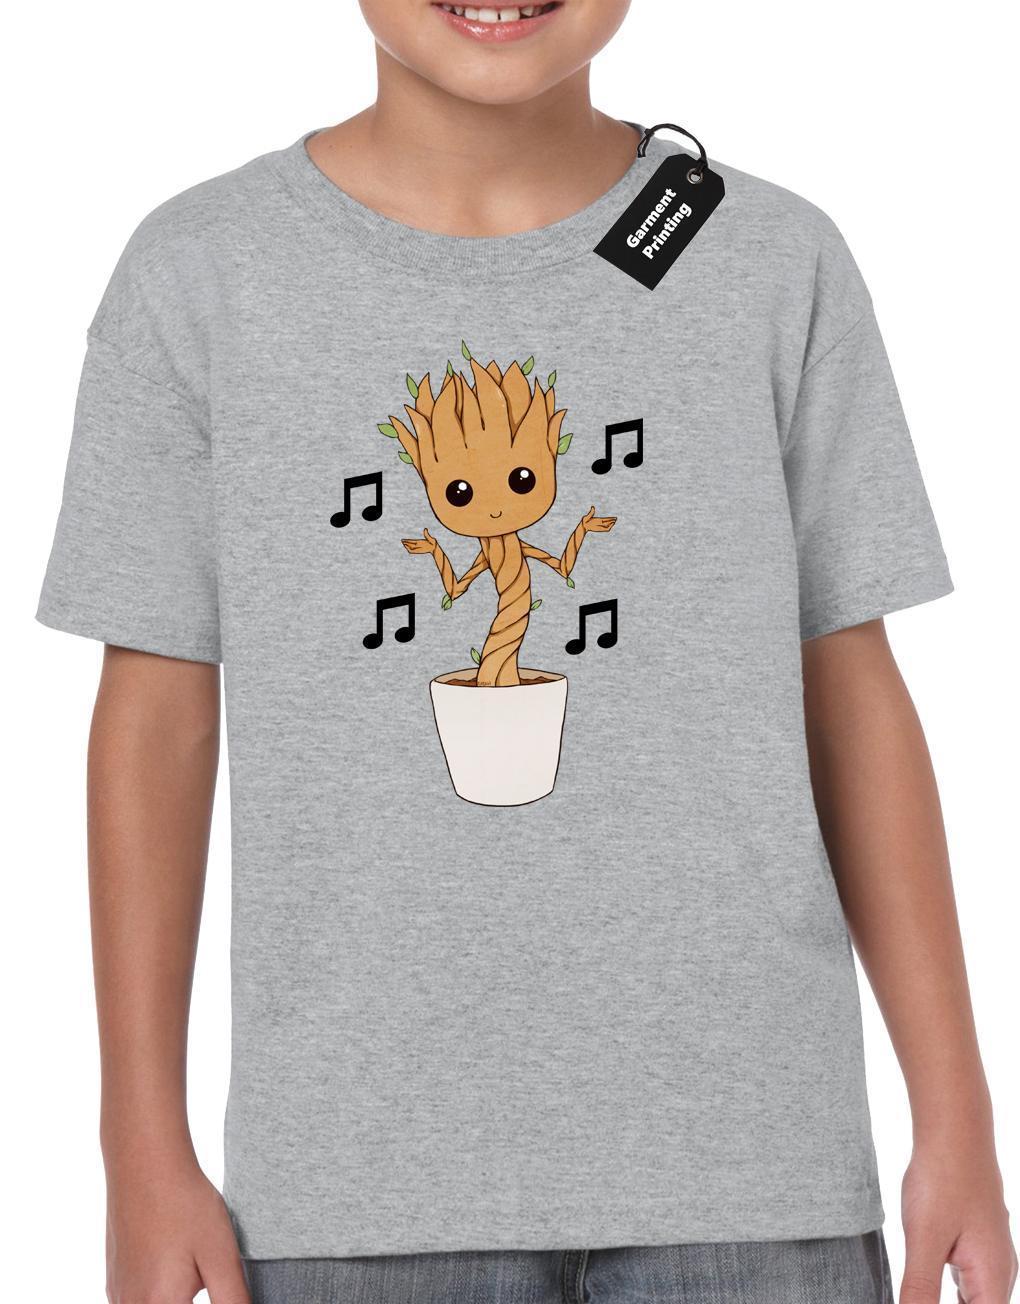 8270eeb18 GROOT BABY DANCE KIDS CHILDRENS T SHIRT TOP GUARDIANS AVENGER HULK FAN COL  All T Shirt Order Tee Shirts From Lefan01, $14.67| DHgate.Com